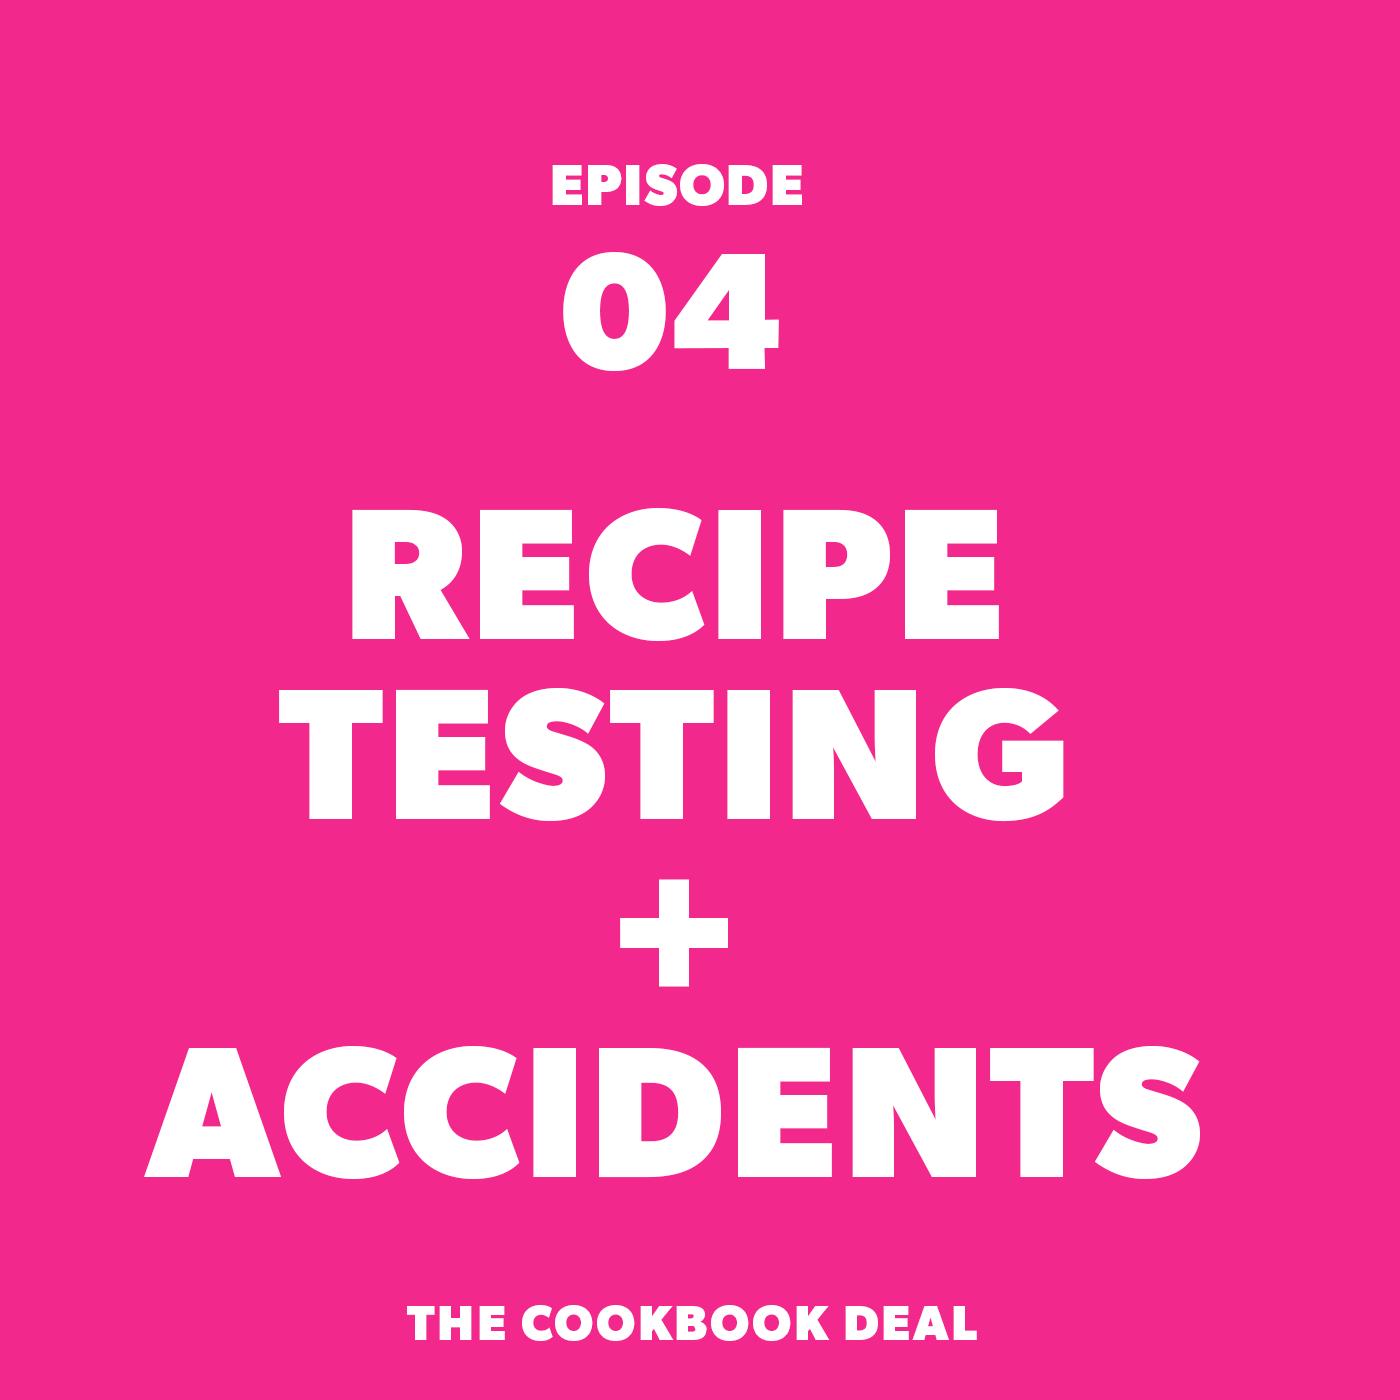 Cookbook-Deal-Pod-Intro-1400.png